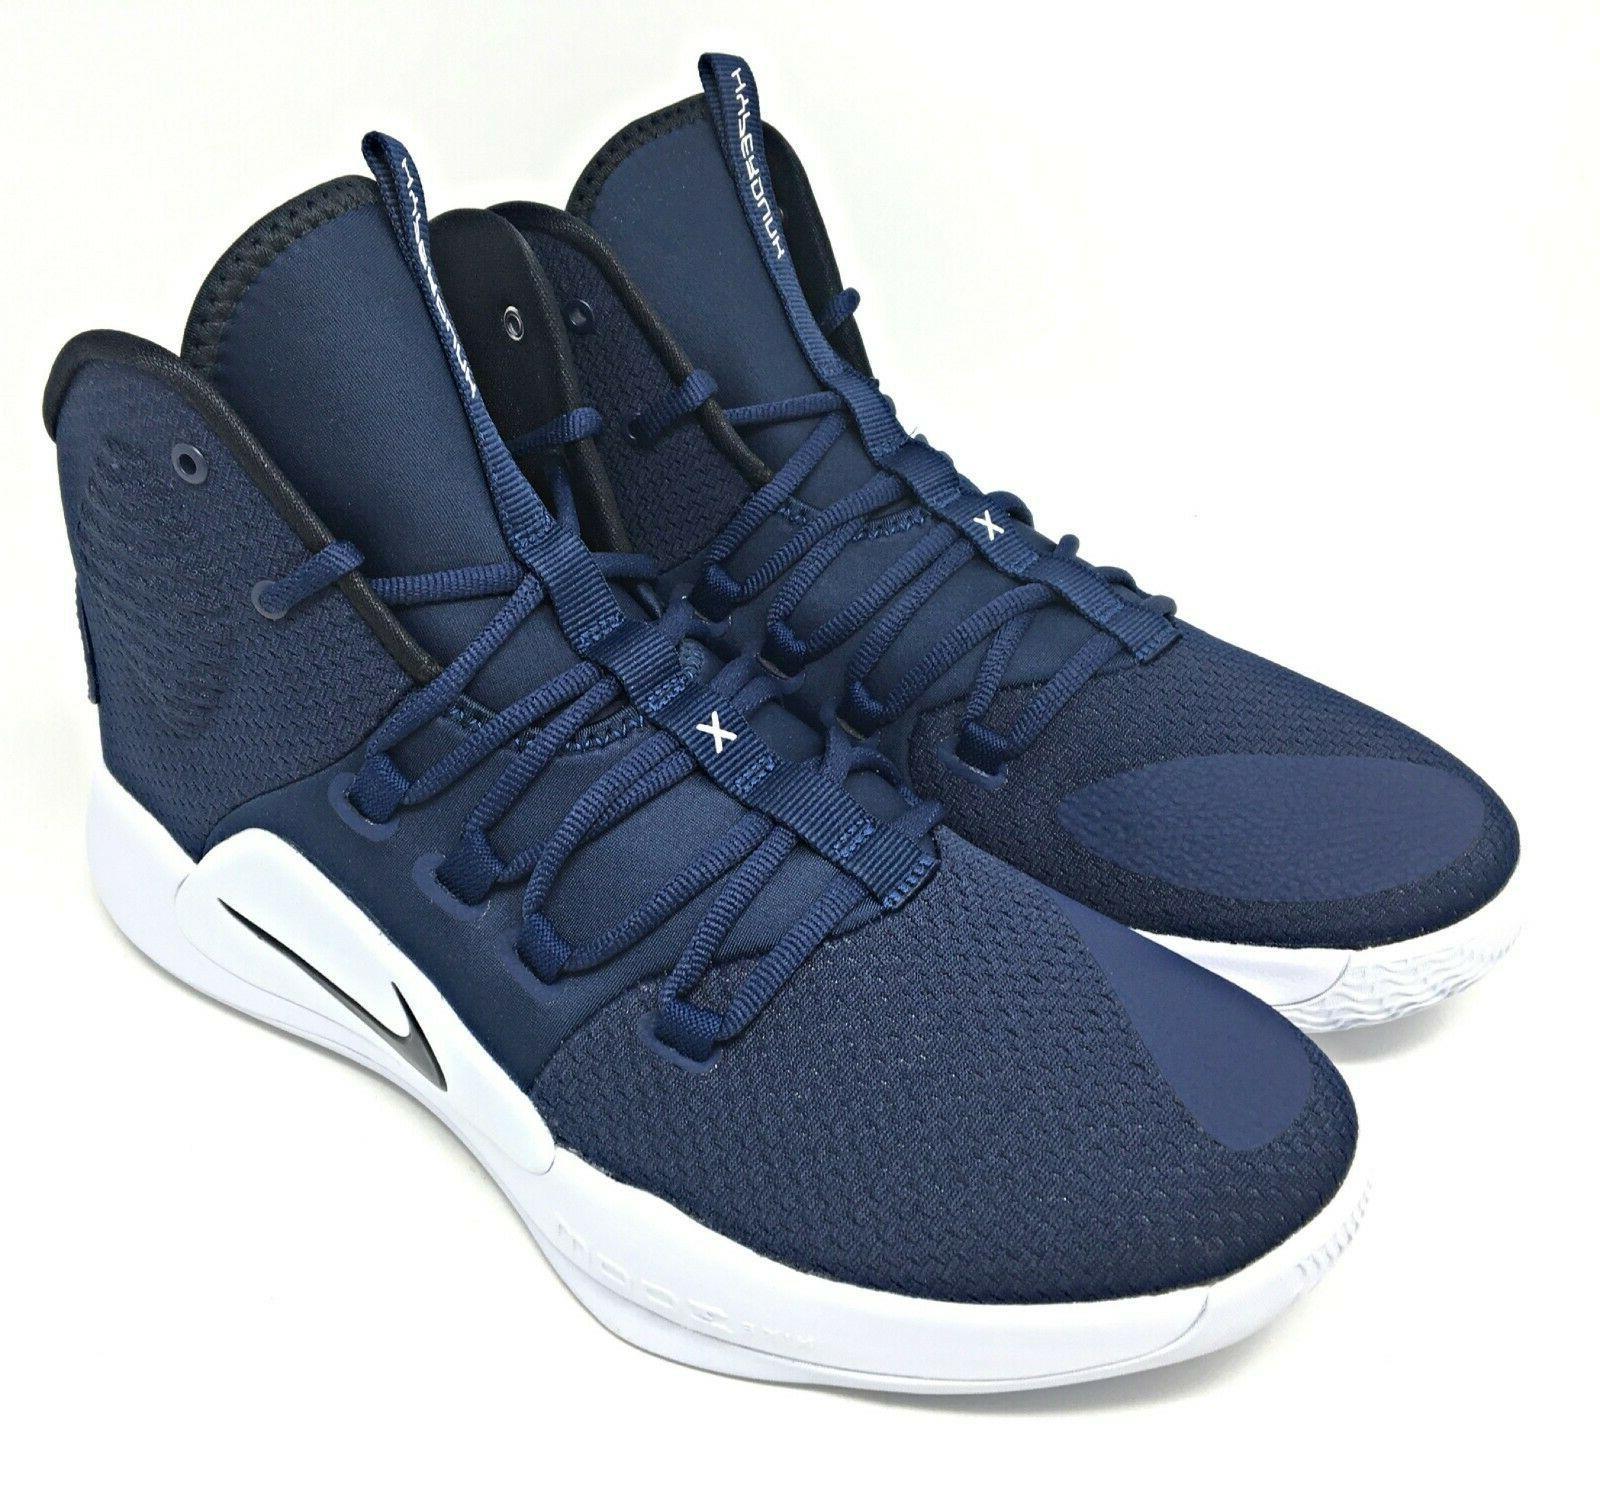 Nike Hyperdunk TB Mens/Womens Basketball Shoes Blue/White AR0467 402